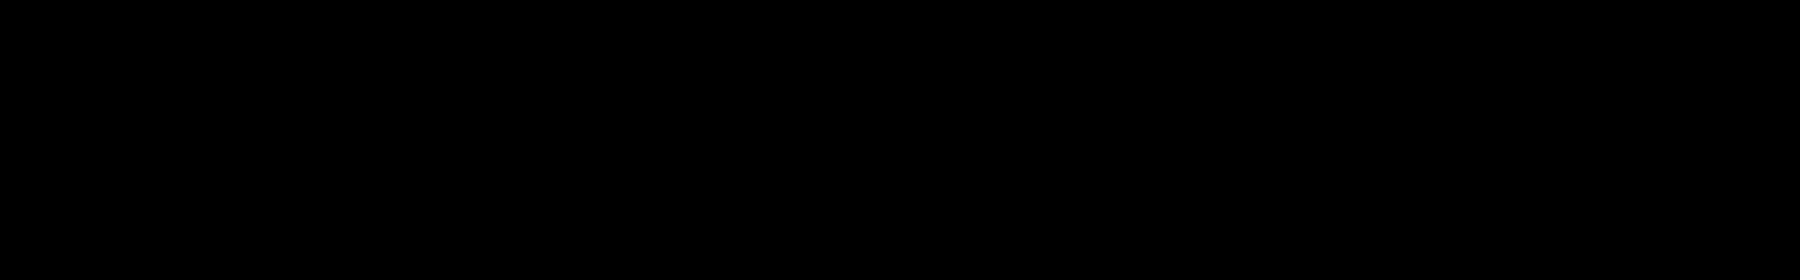 Melodic Techno Connection audio waveform